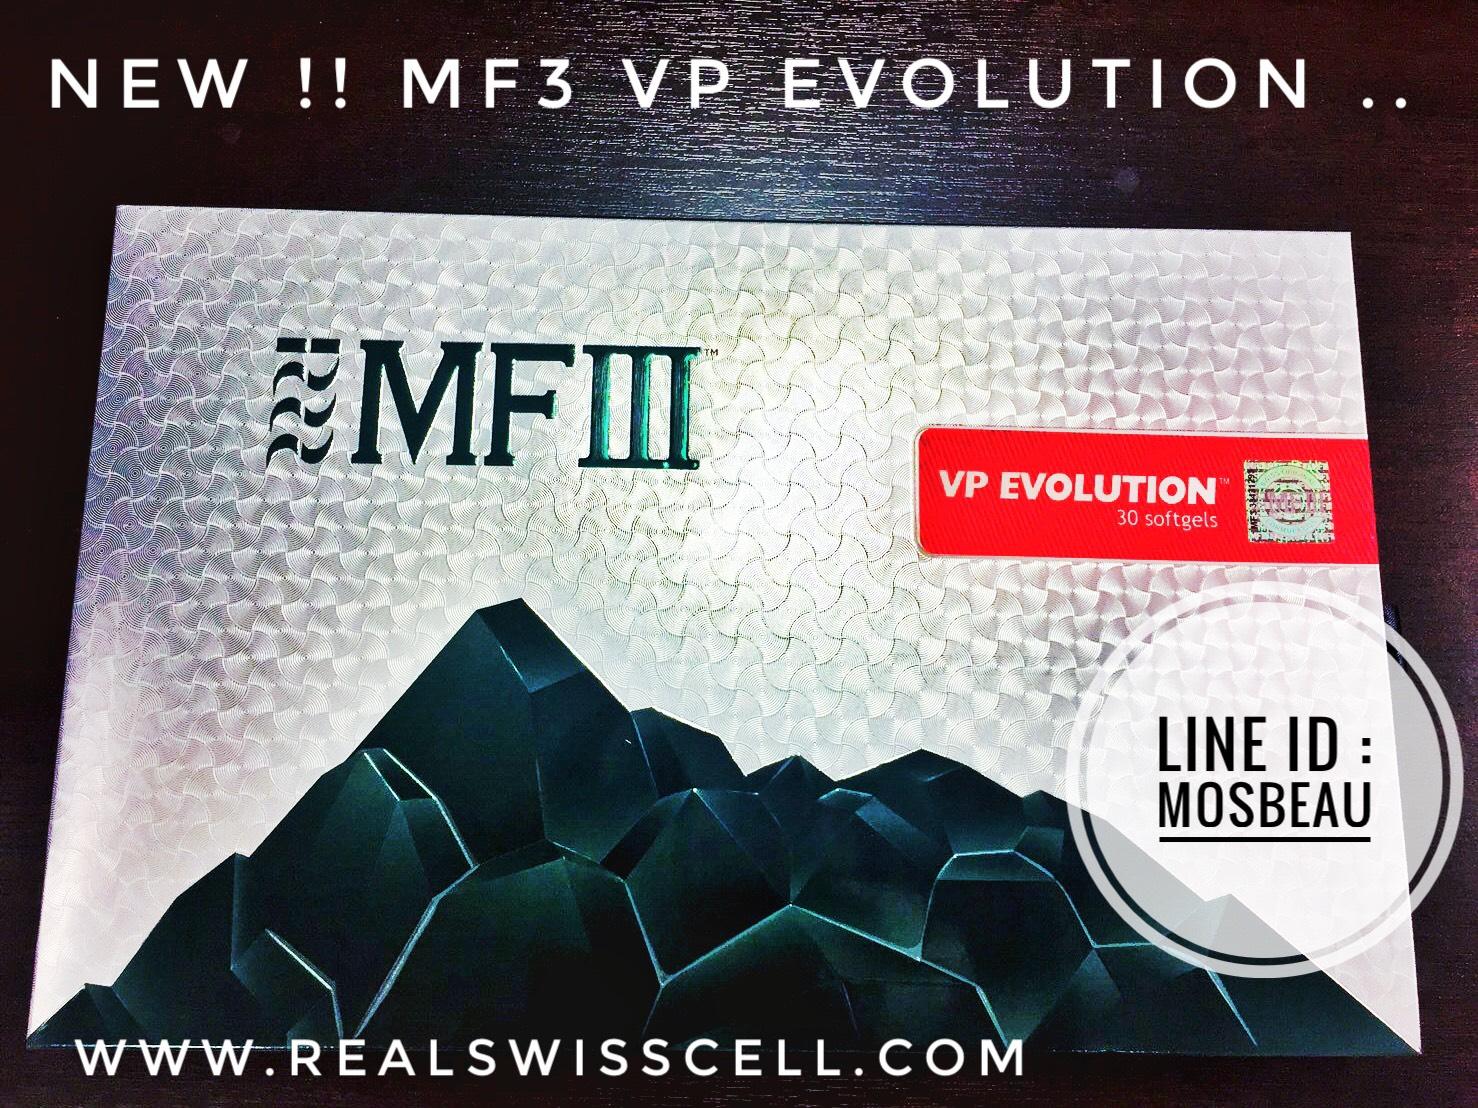 NEW...MF3 VP EVOLUTION Enhanced formulation of Vegetal Placenta Extracts with botanical ingredients for skin rejuvenation, cellular renewal, cardiovascular health, and complete wellness.